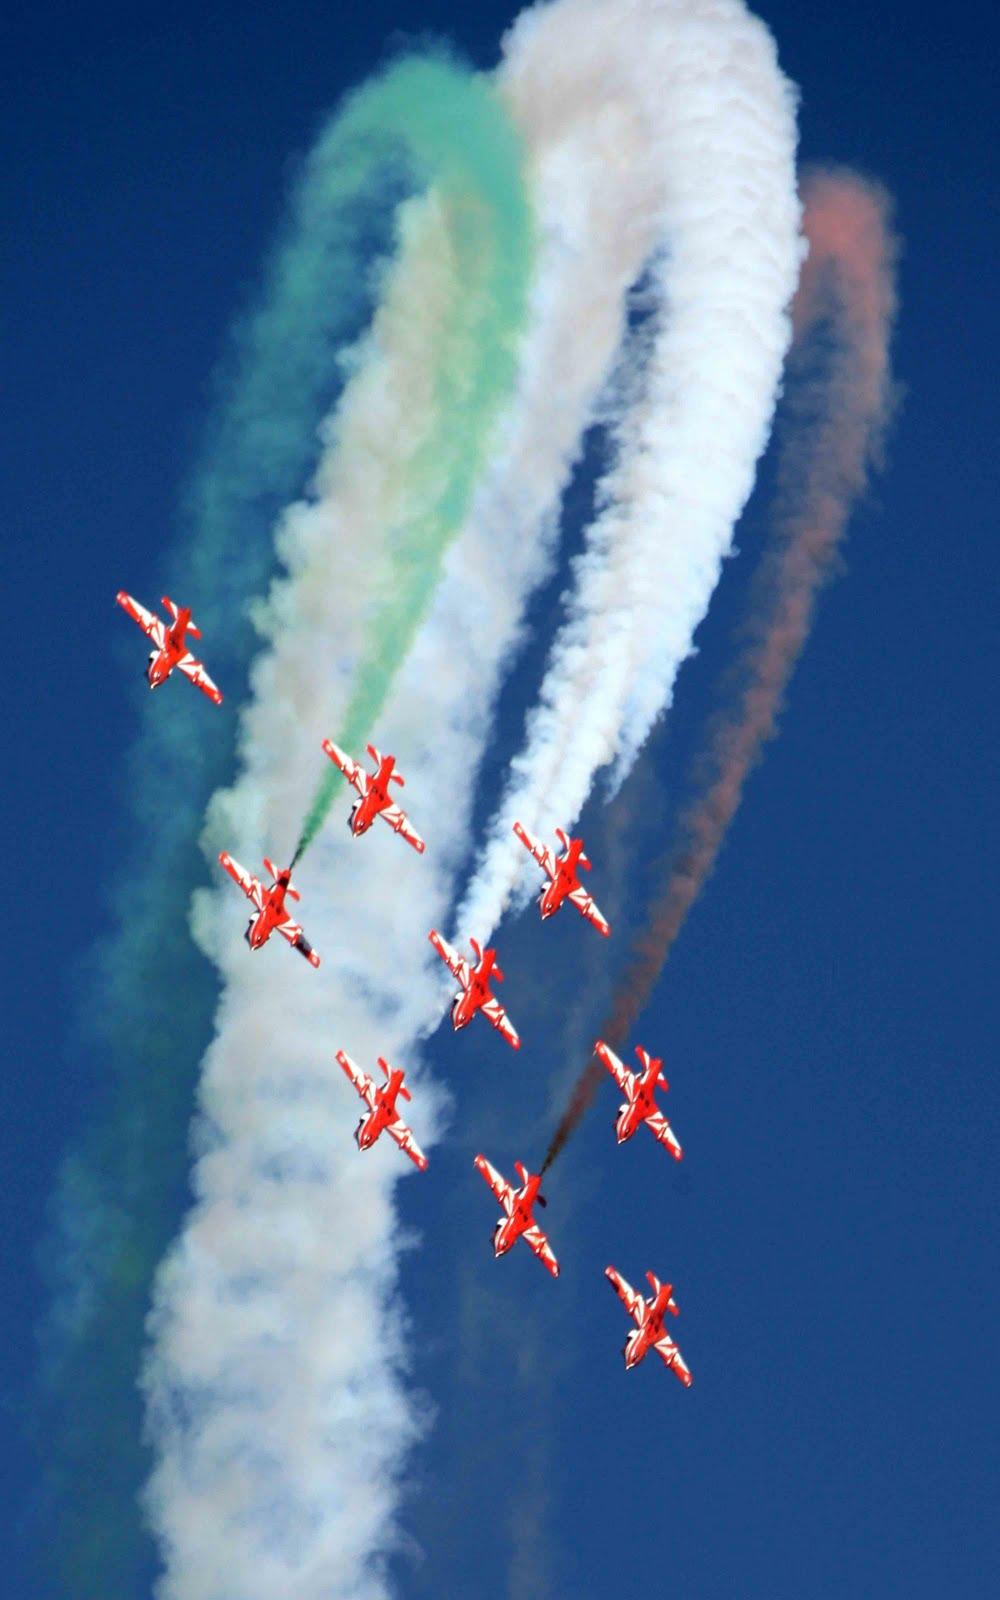 broadsword: 21 more hawks for iaf's surya kiran aerobatics display team